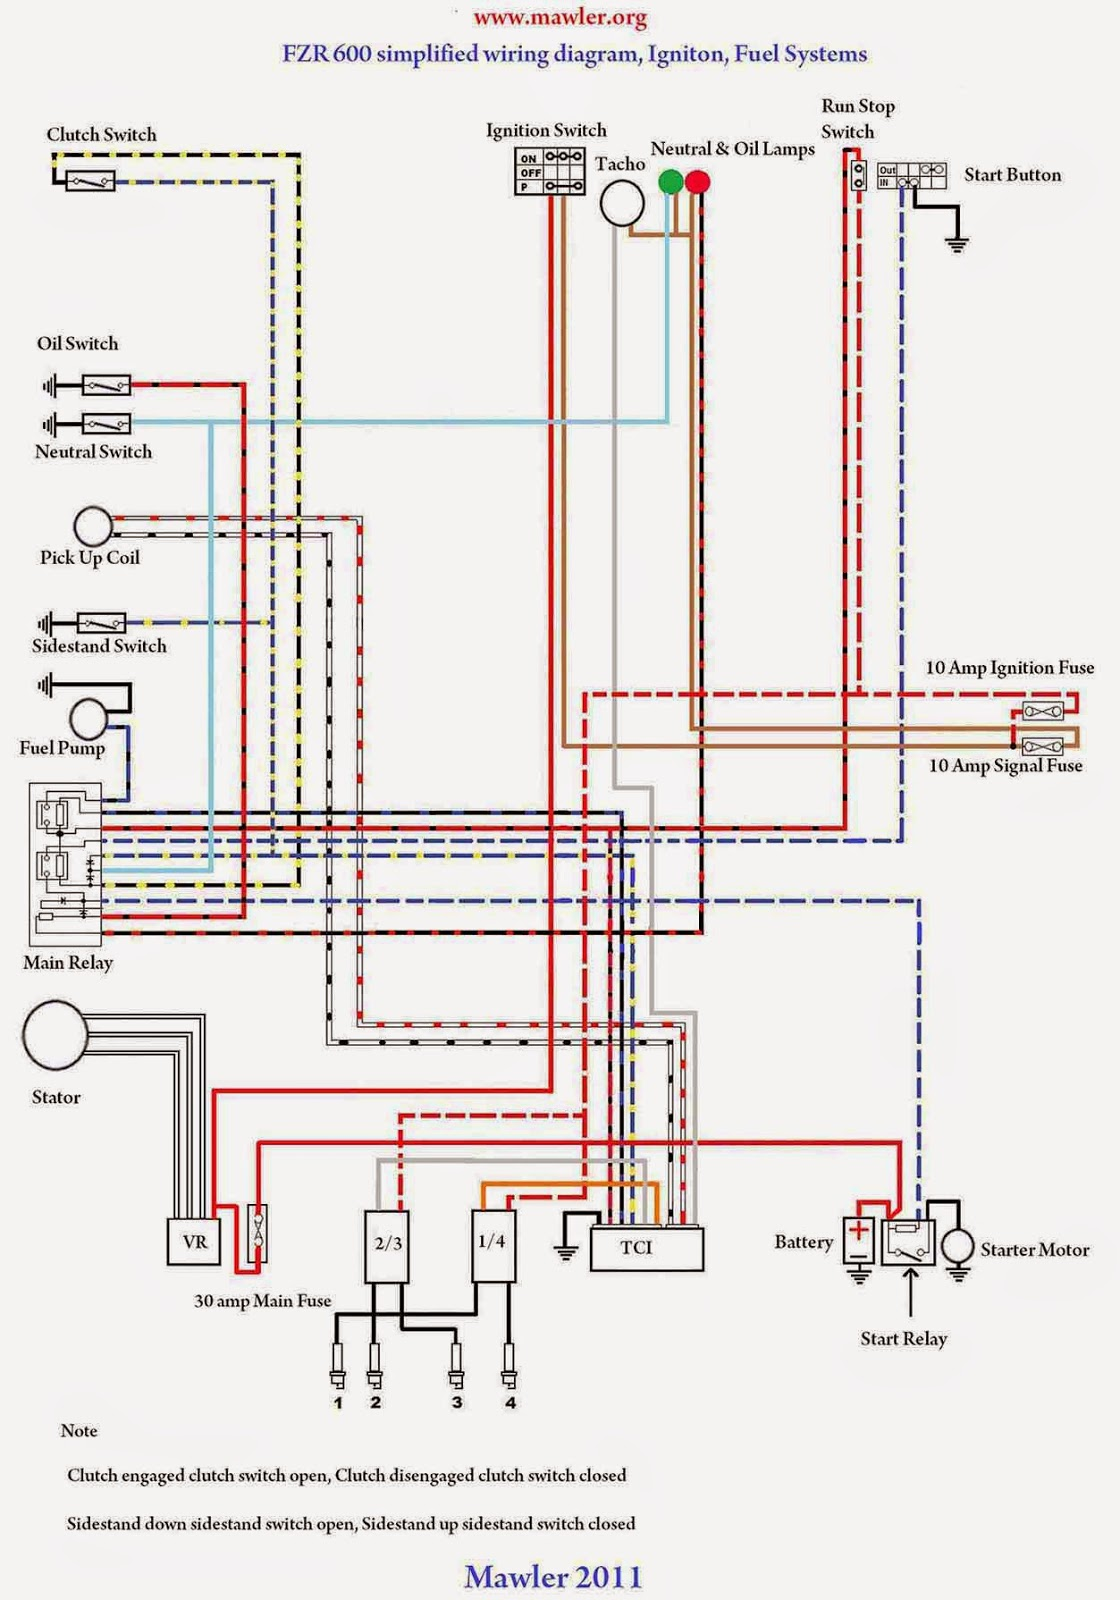 medium resolution of  yamaha fzr600 wiring diagram images of furthermore yamaha 600 wiring sc fzr600 wiring diagram at cita